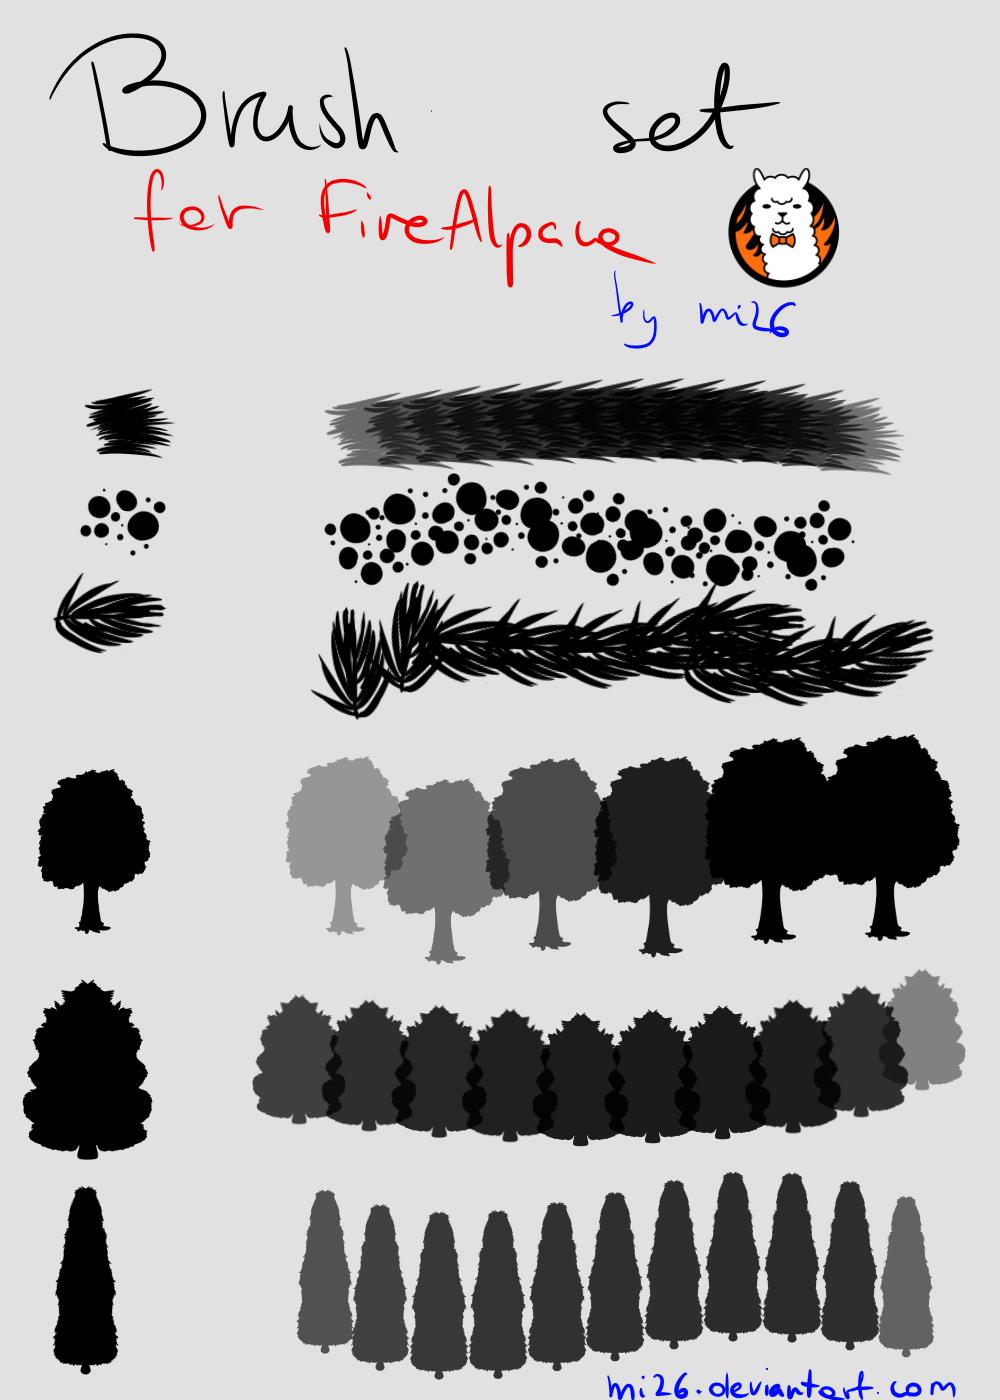 Firealpaca Custom Brushes Flowers Related Keywords & Suggestions